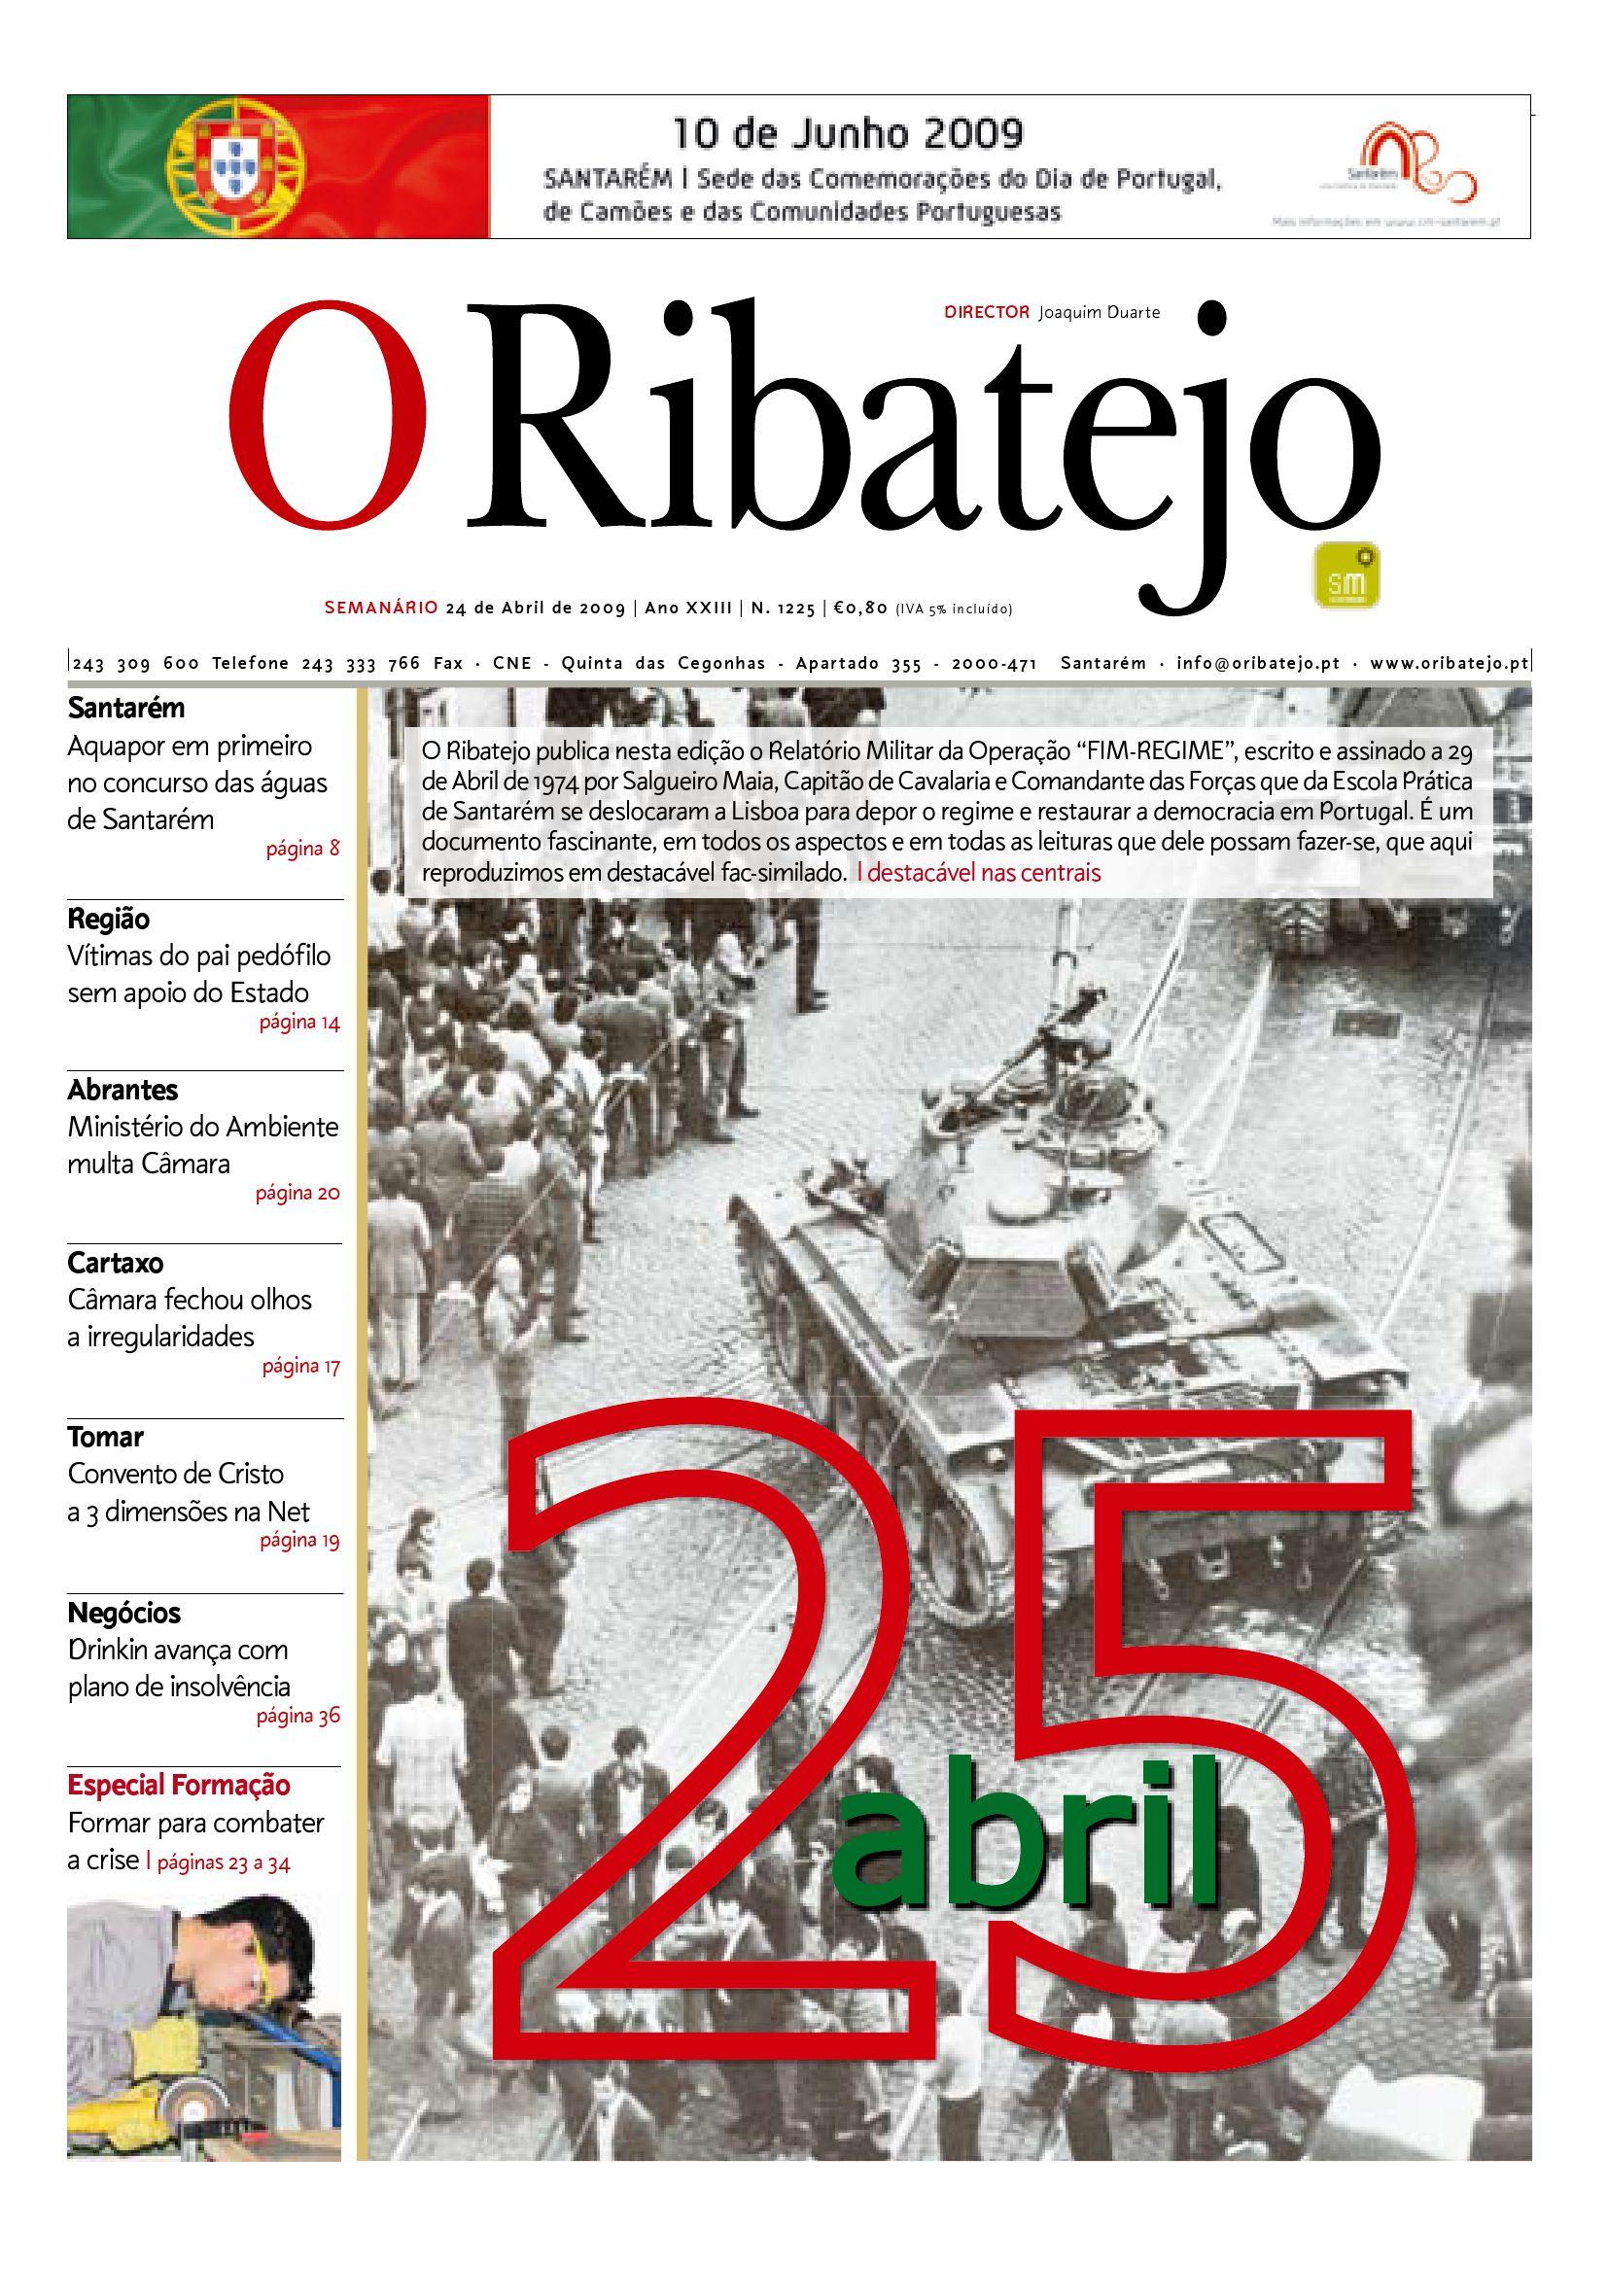 5cce659c58d6 Edição 1225 O Ribatejo by Jornal O Ribatejo - issuu